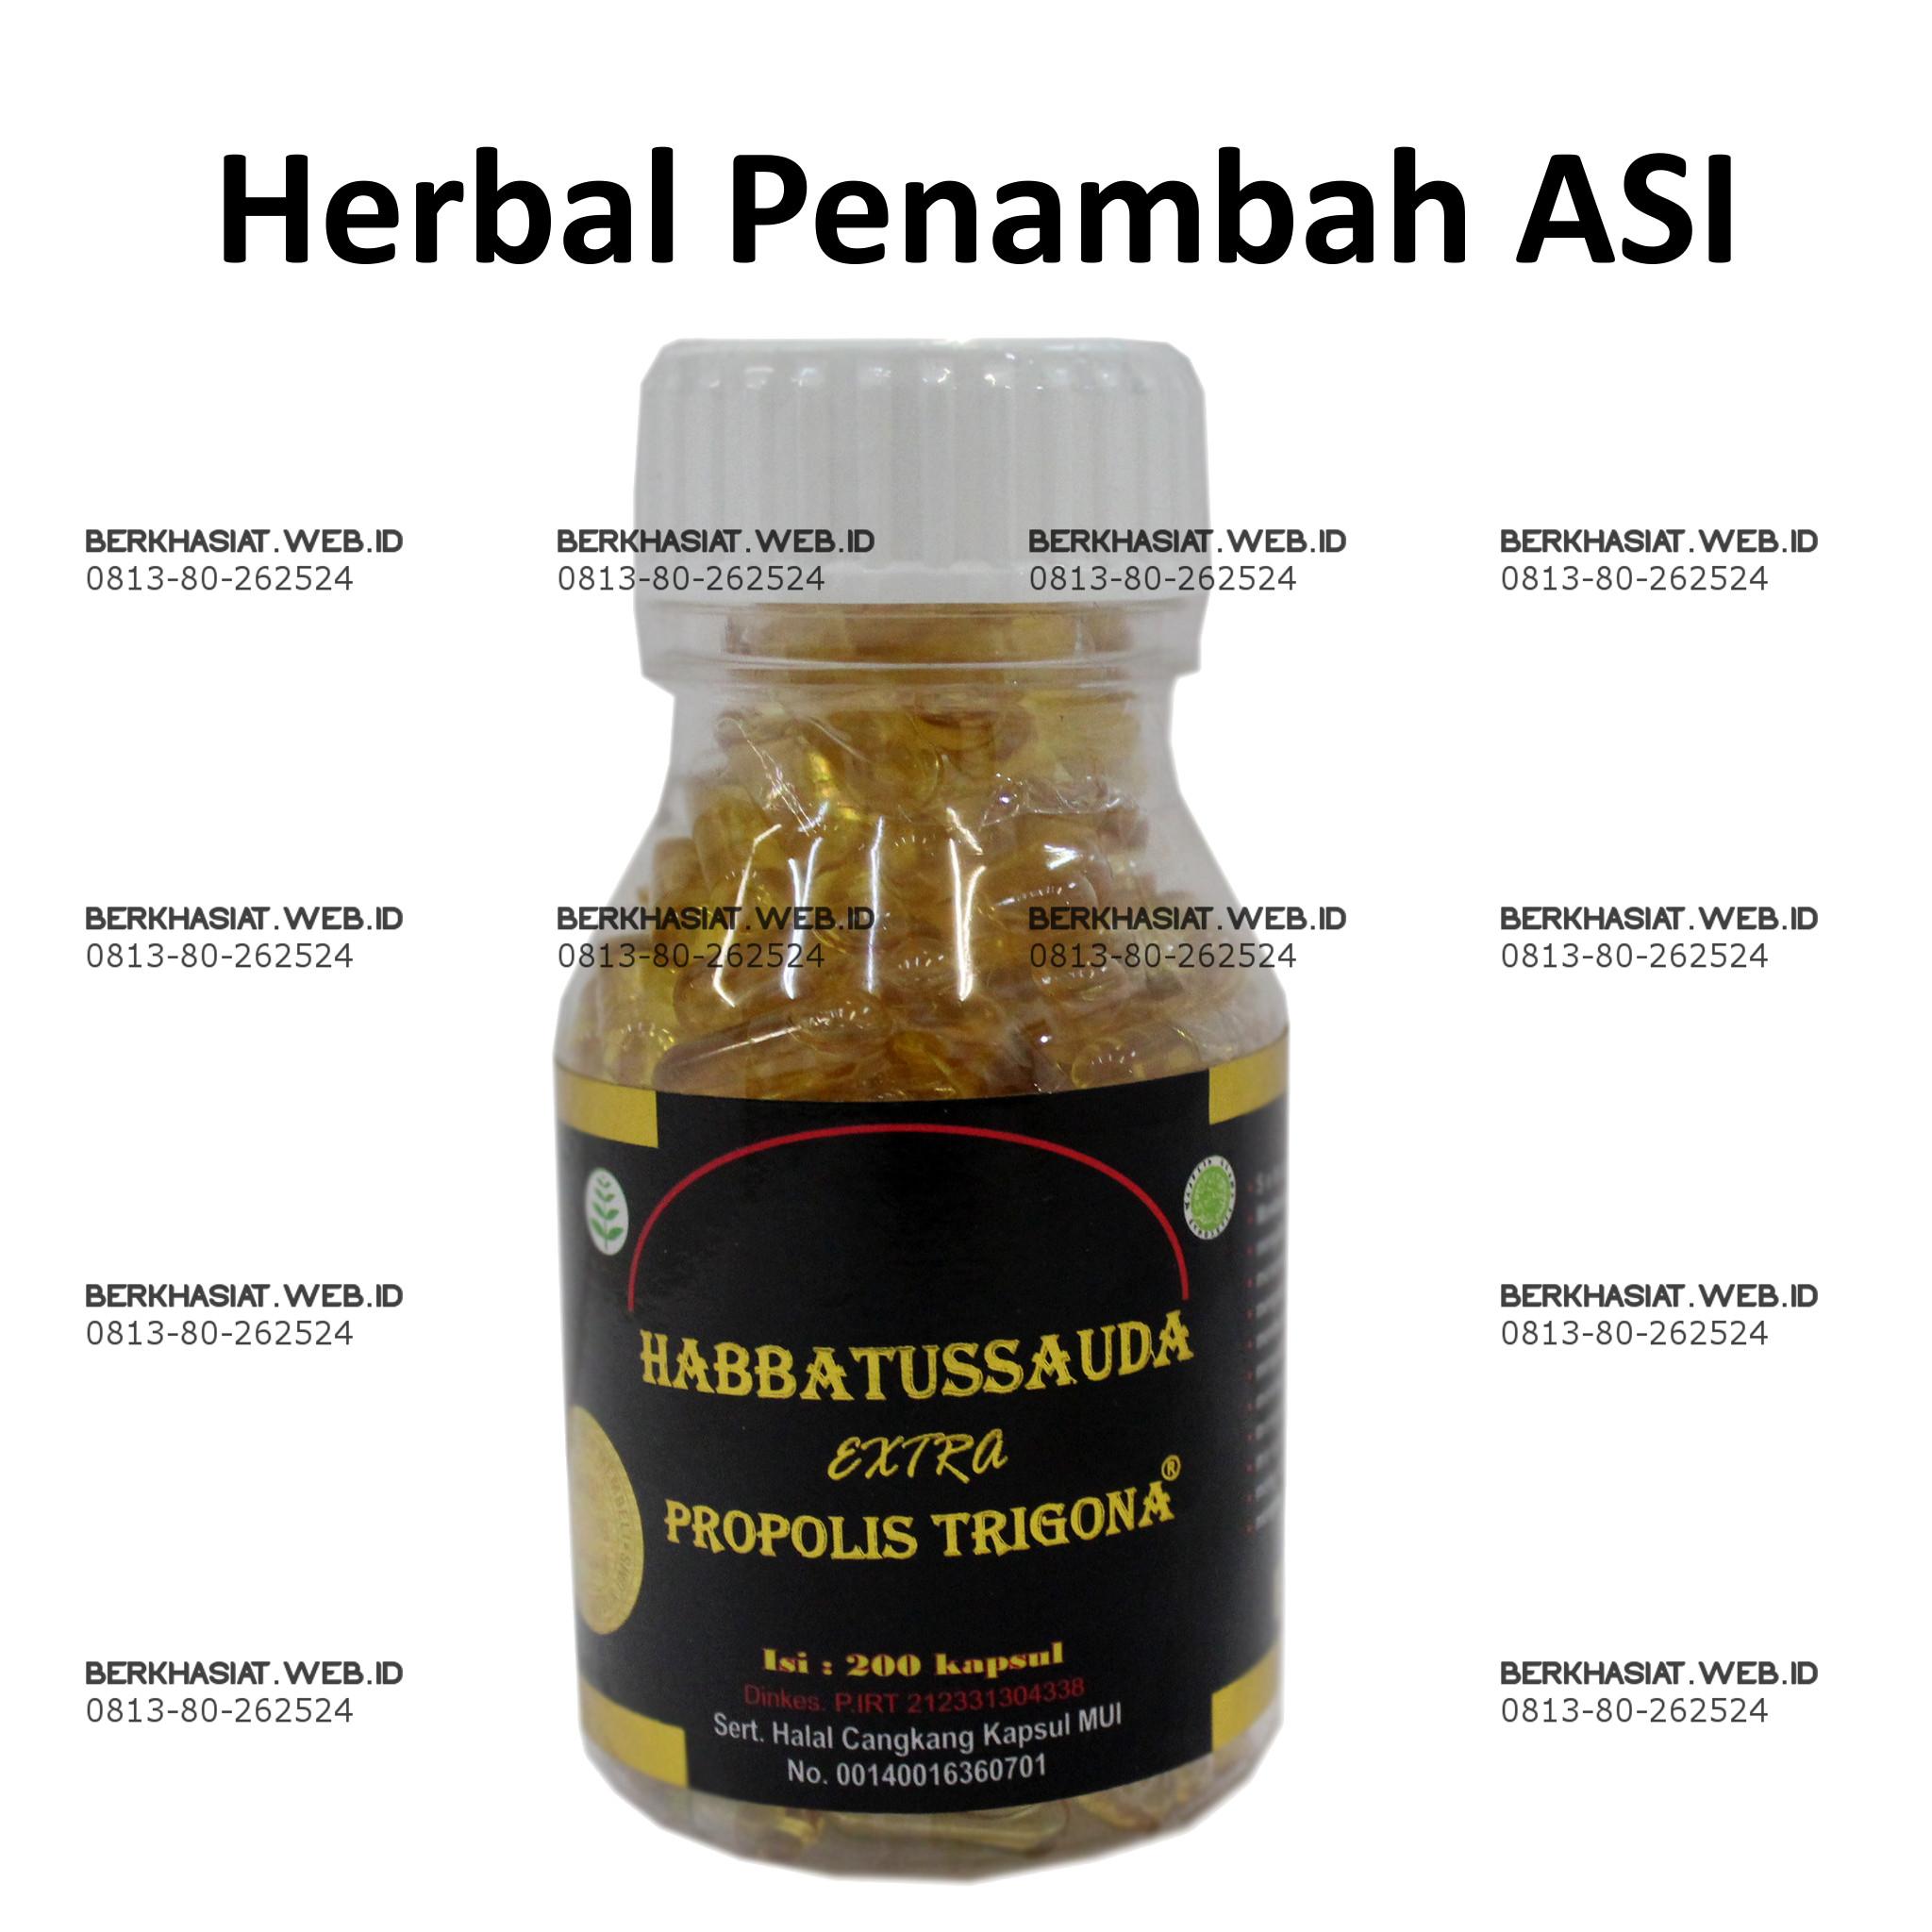 Jual Menambah Asi Herbal Propolis Trigona Plus Habbatussauda Habatussauda 200 Kapsul Penambah Febryan Paudi Tokopedia